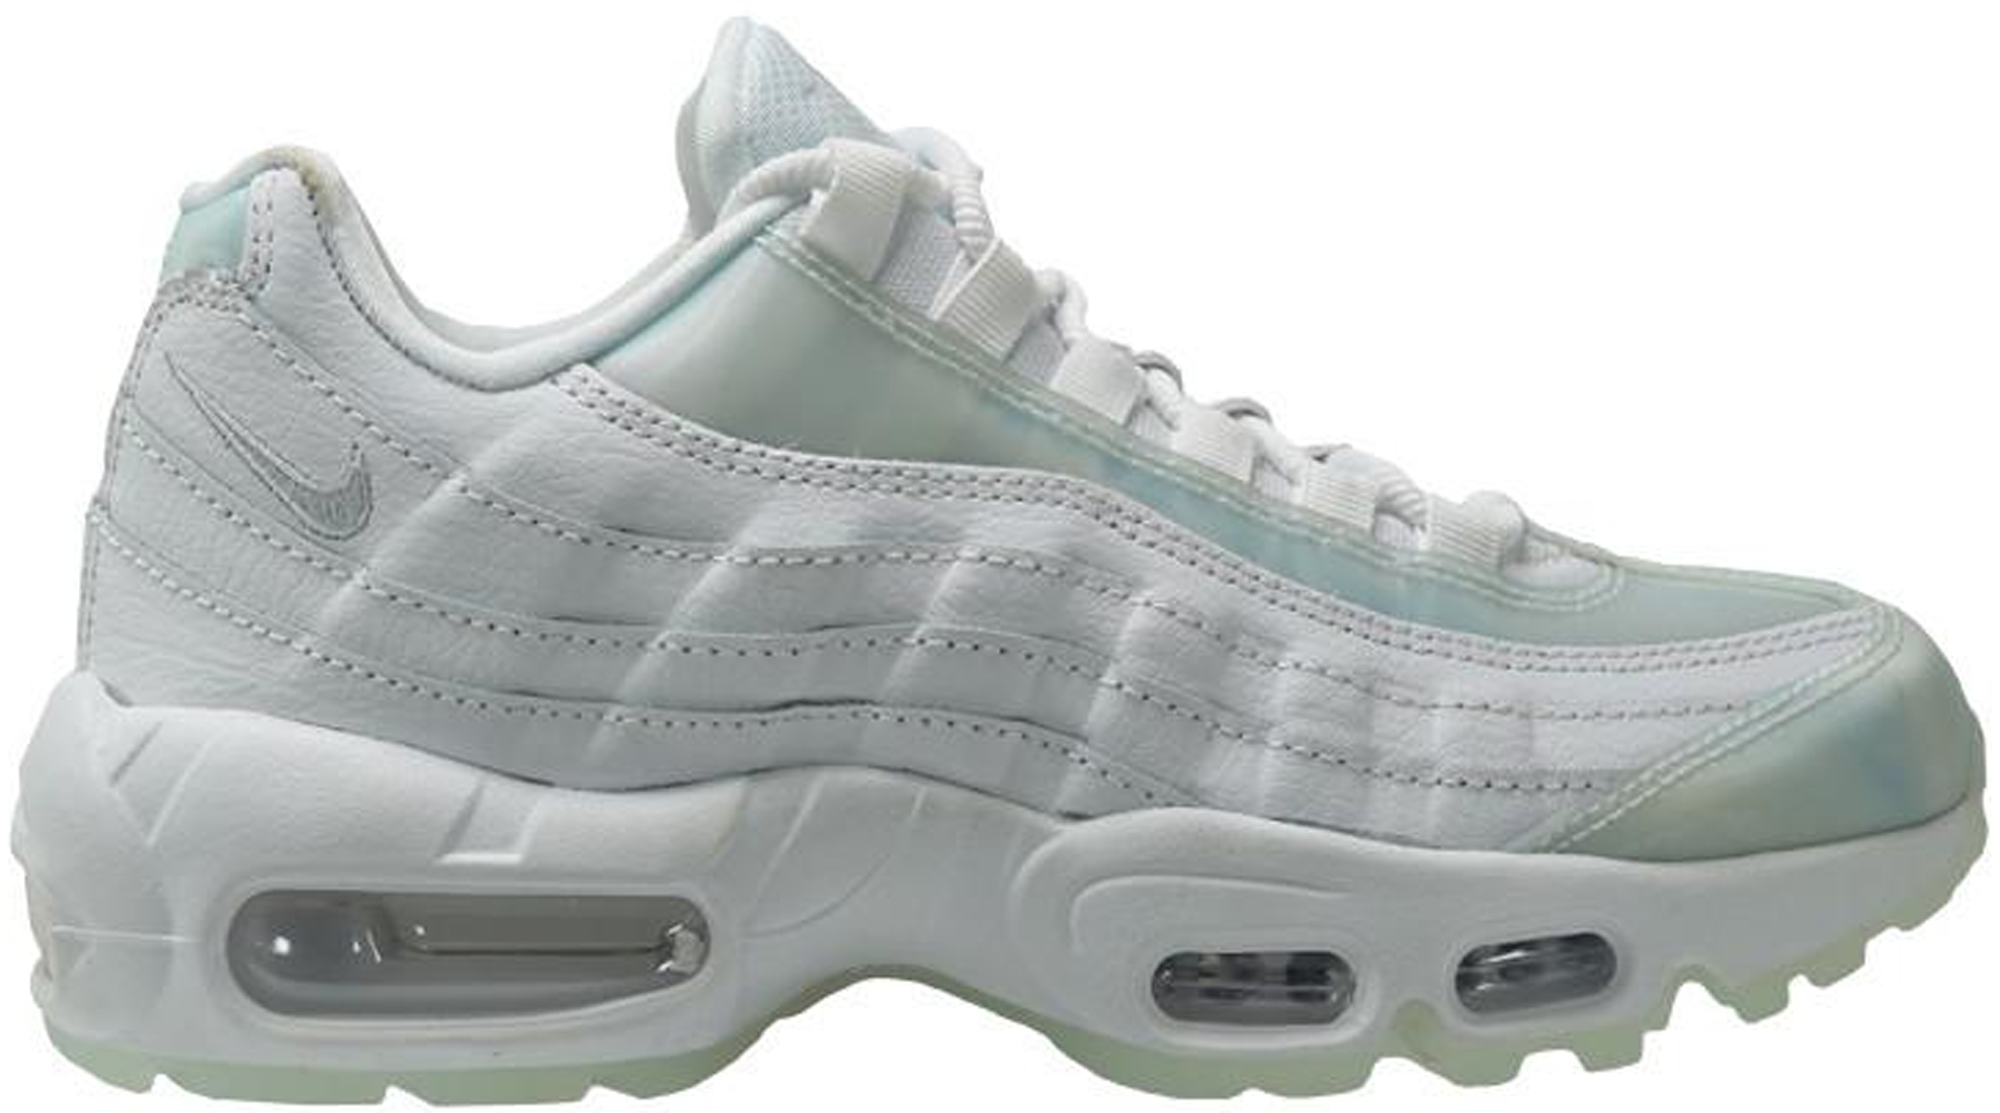 Nike Air Max 95 White Platinum Ice (W